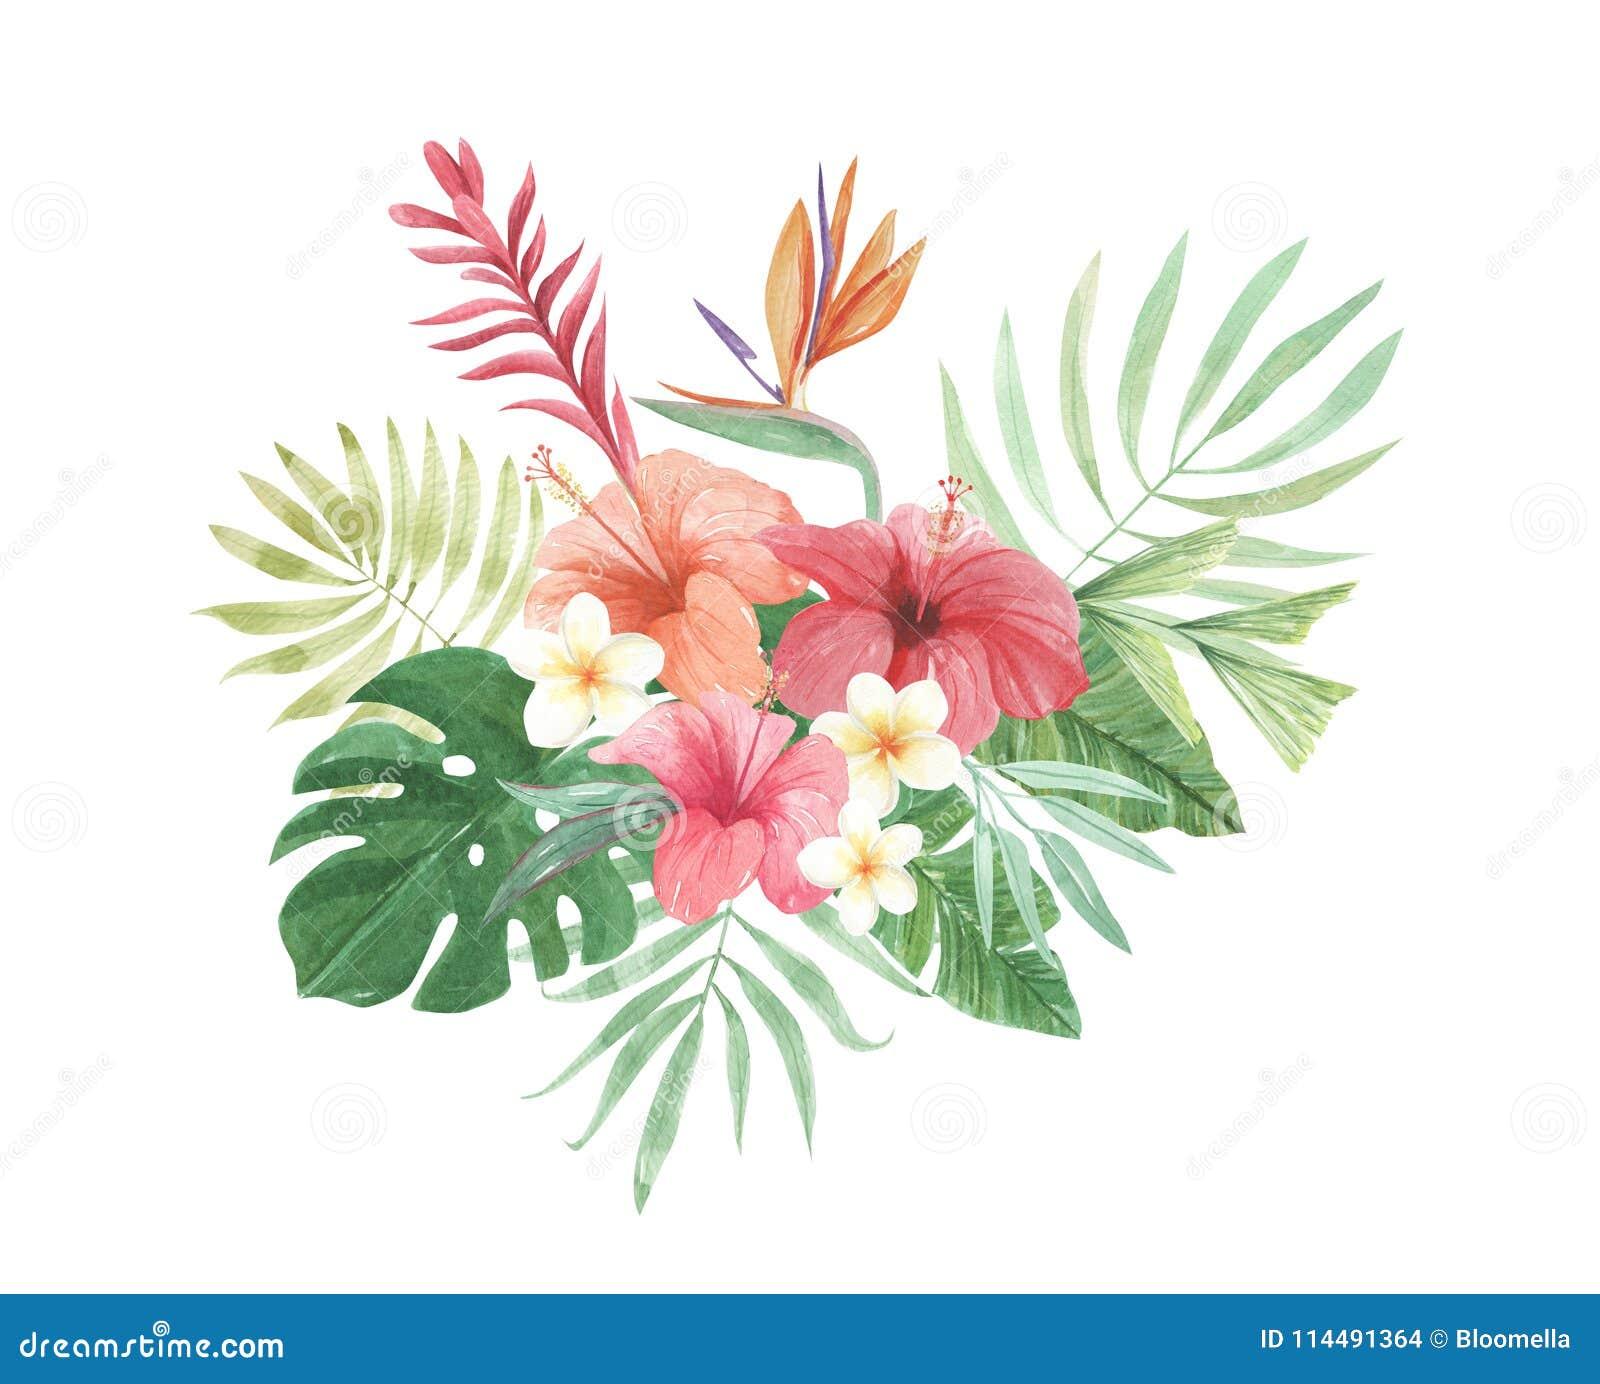 Tropical Floral Tumbler Tropical Flower Arrangement Tropical Tumbler Hibiscus Flowers Aloha Tumbler